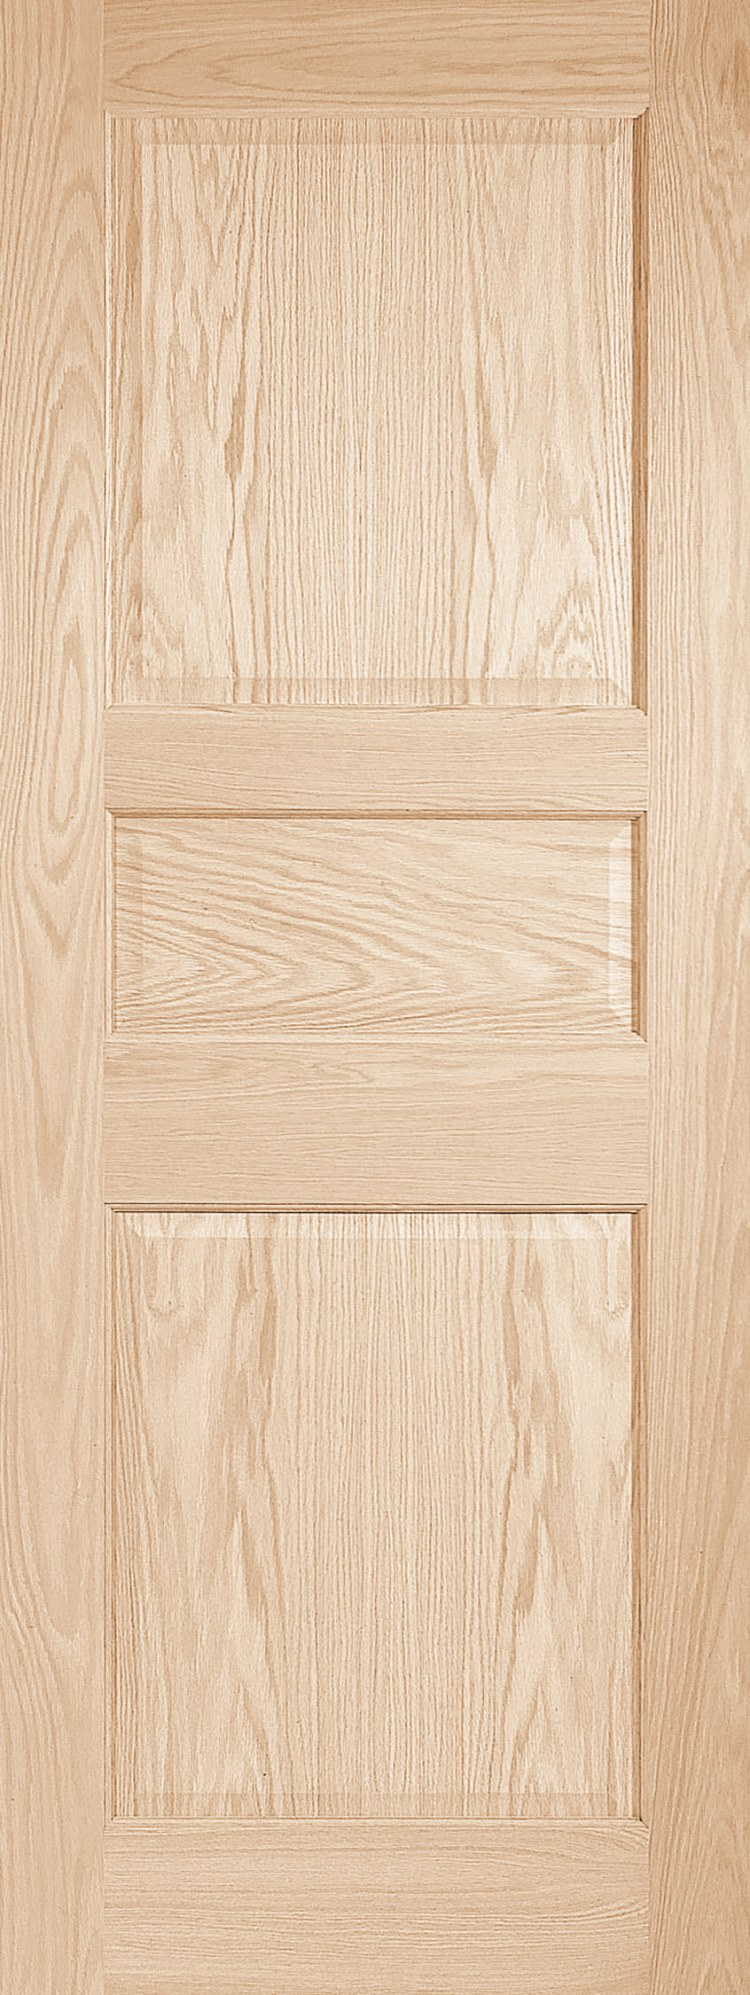 Solid wood jeld wen and doorsmith interior door systems for Scenix porch windows